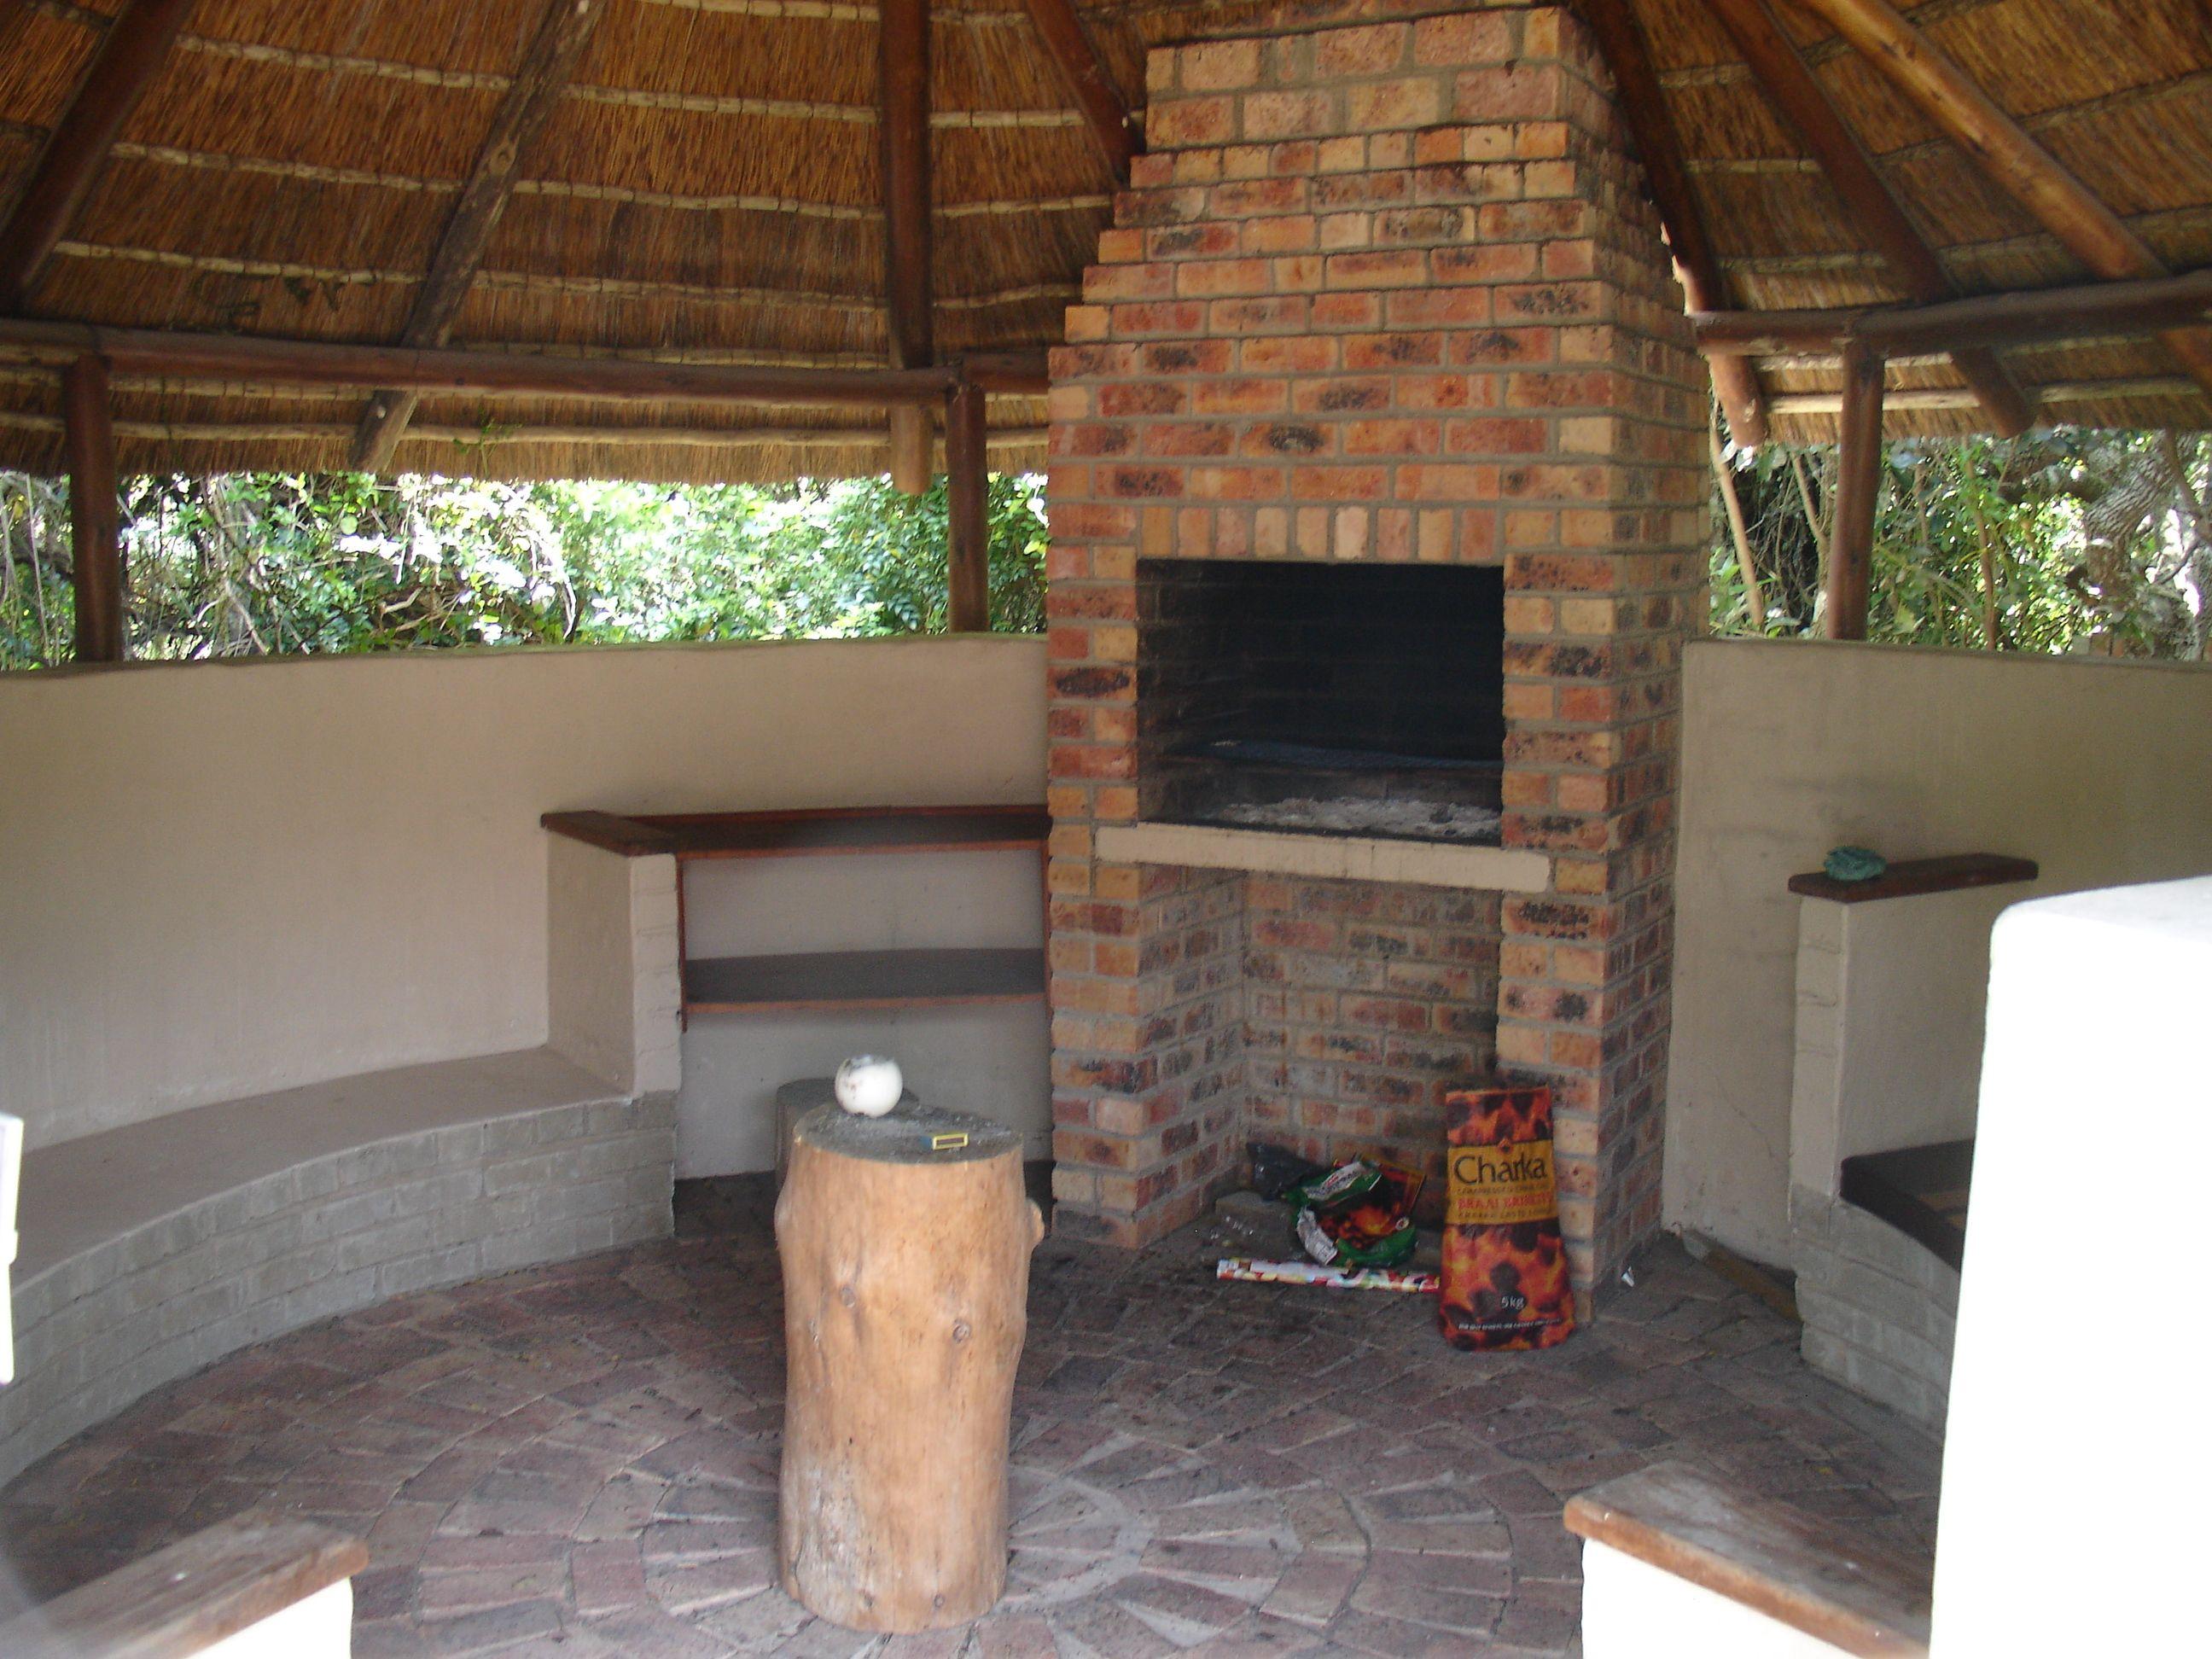 lapa braai easy plain | Our home | Pinterest | Easy ... on Small Backyard Entertainment Area Ideas id=58150